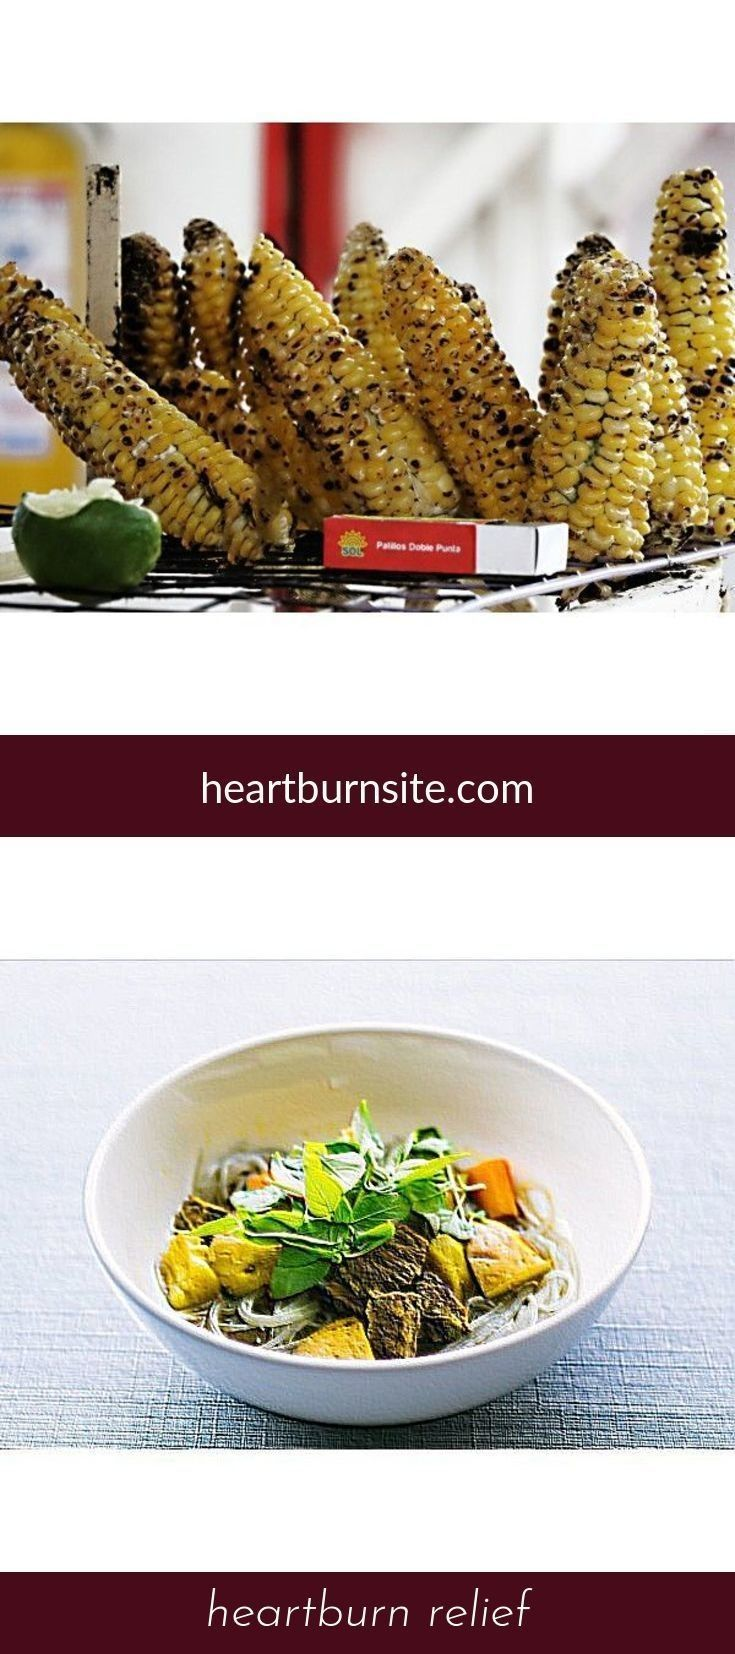 foods that help heartburn # #heartburnremedies | heartburn remedies